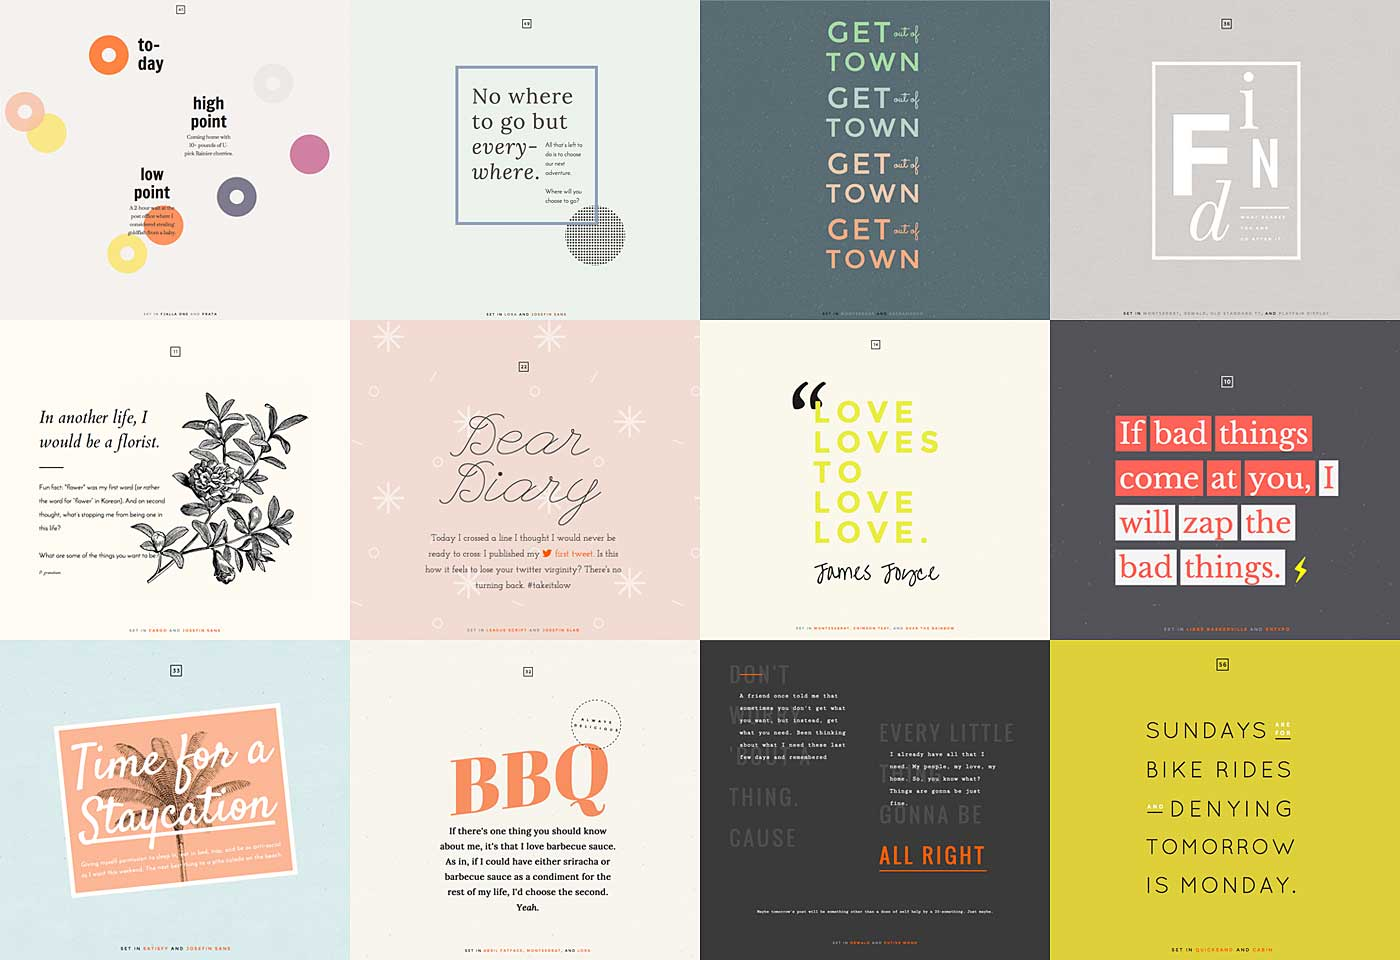 Schrift-Inspiration - 100 Days of Fonts